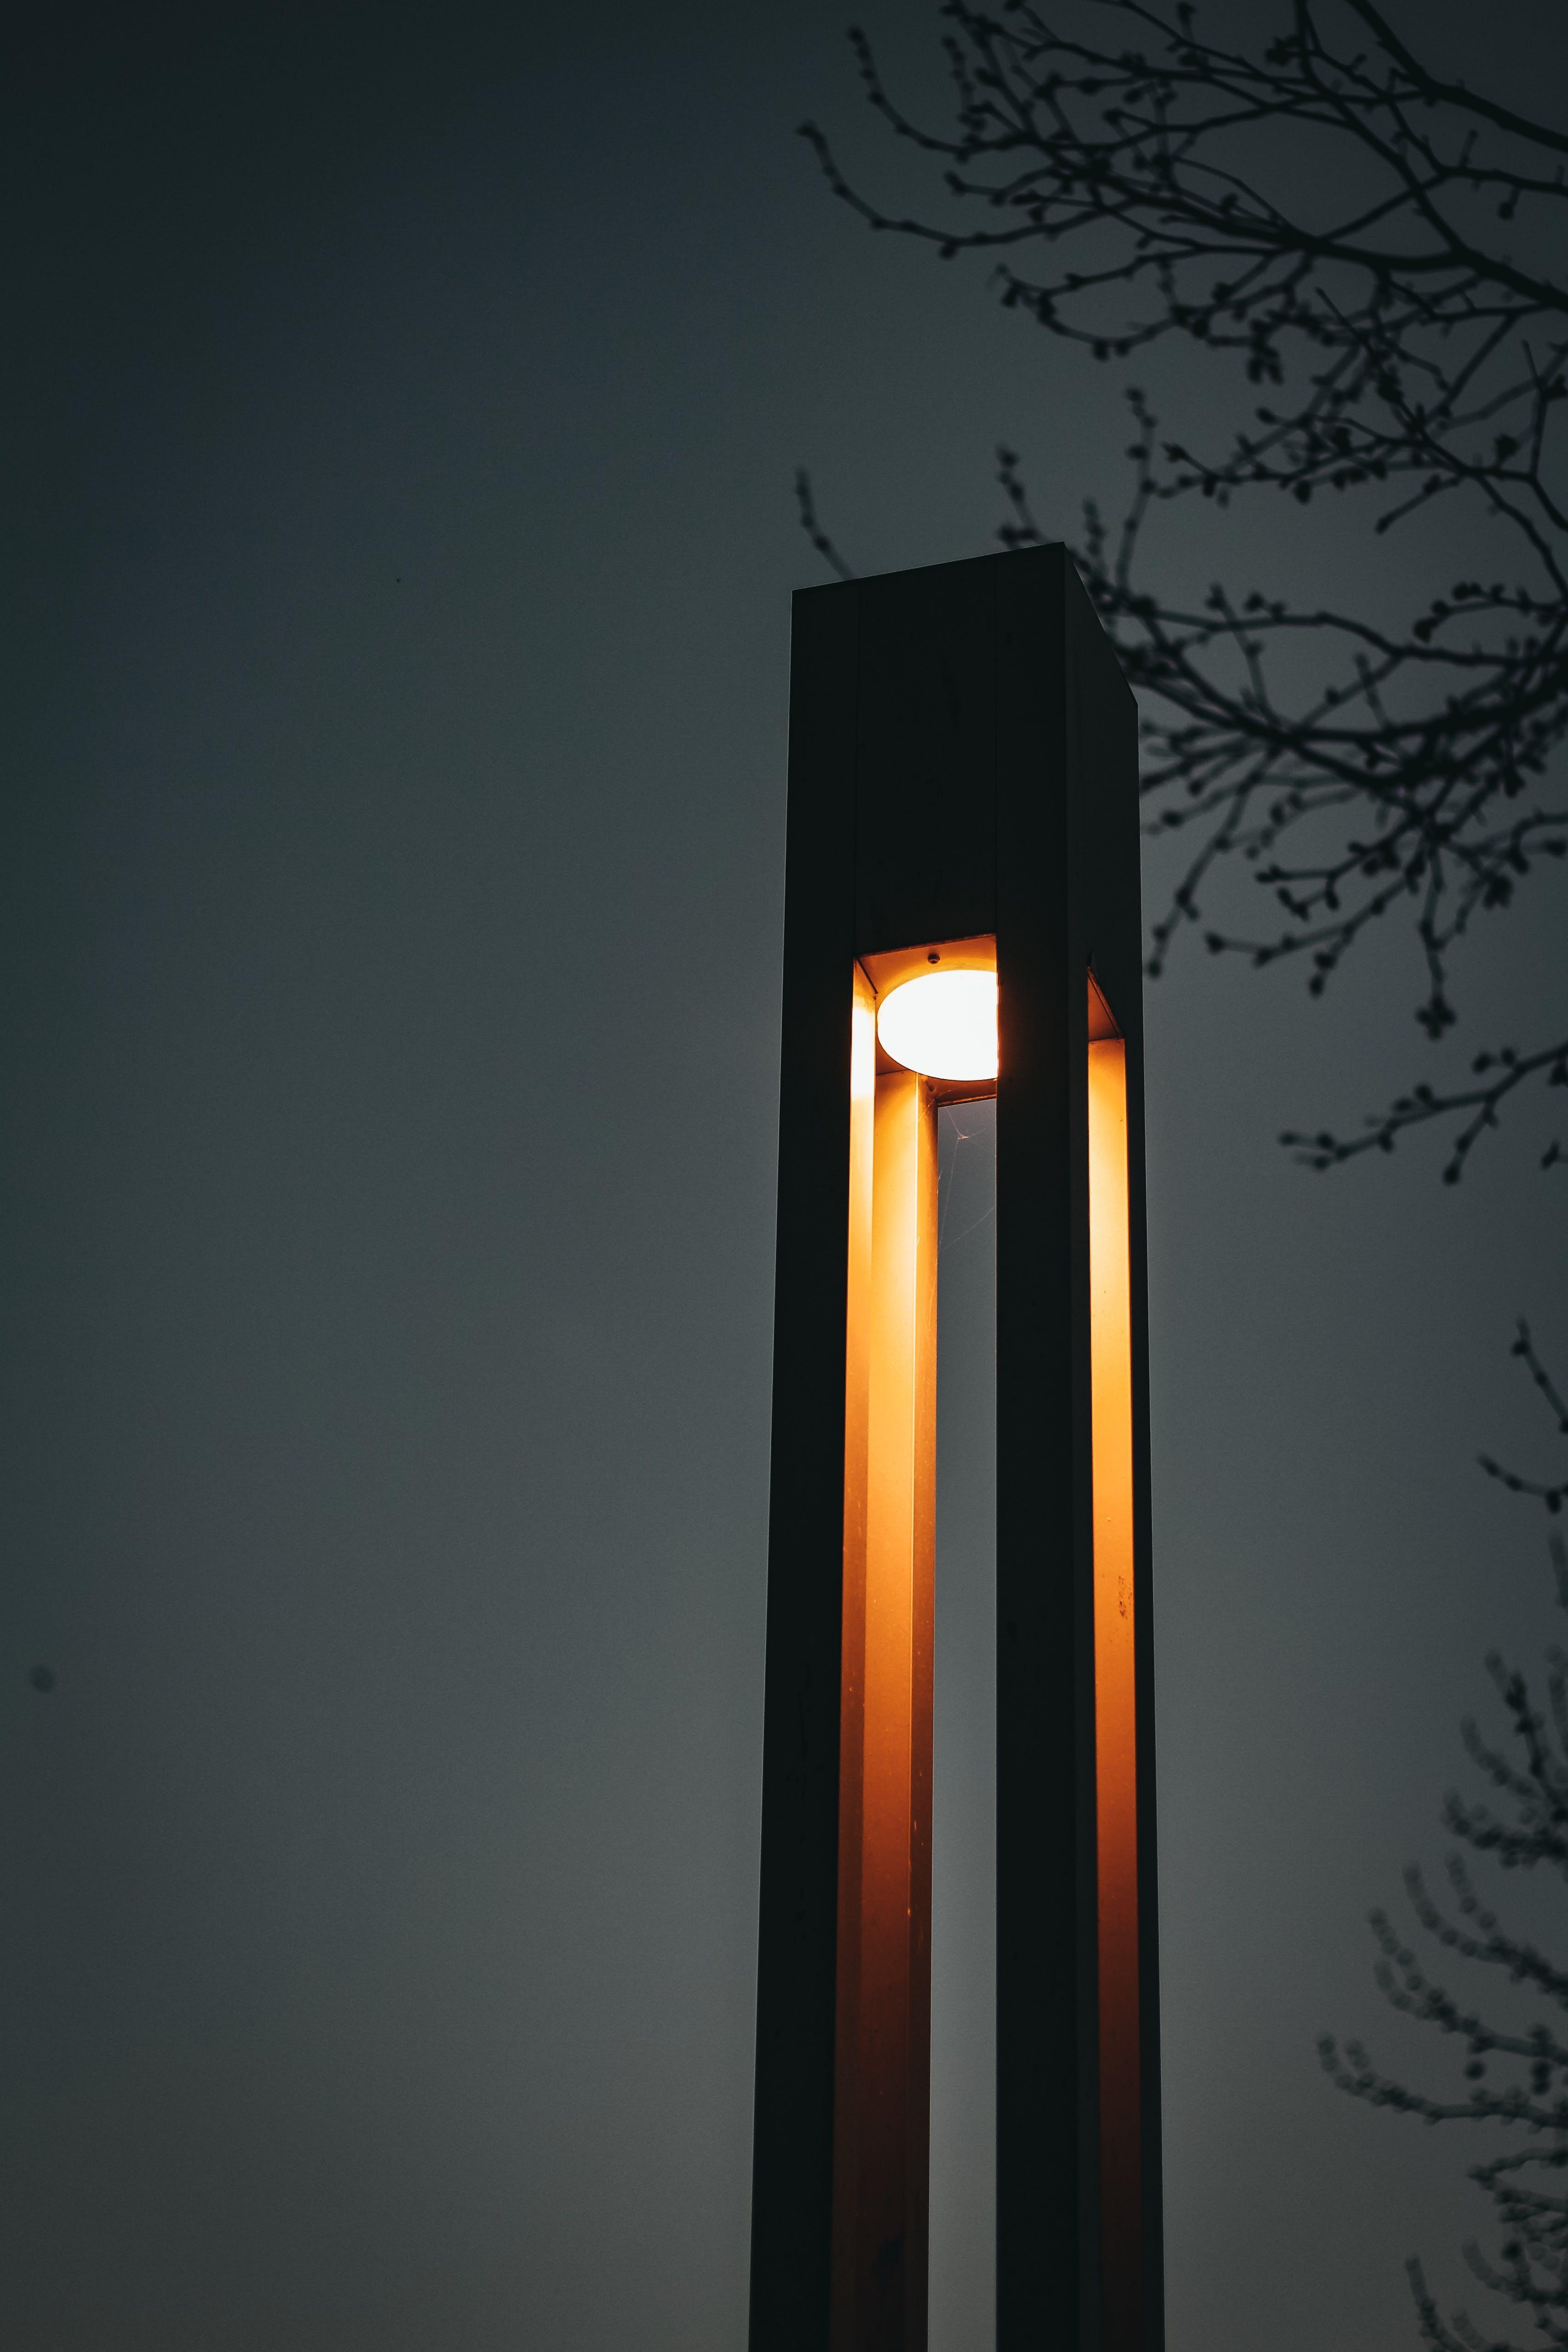 Black Lamp Post Near Tree